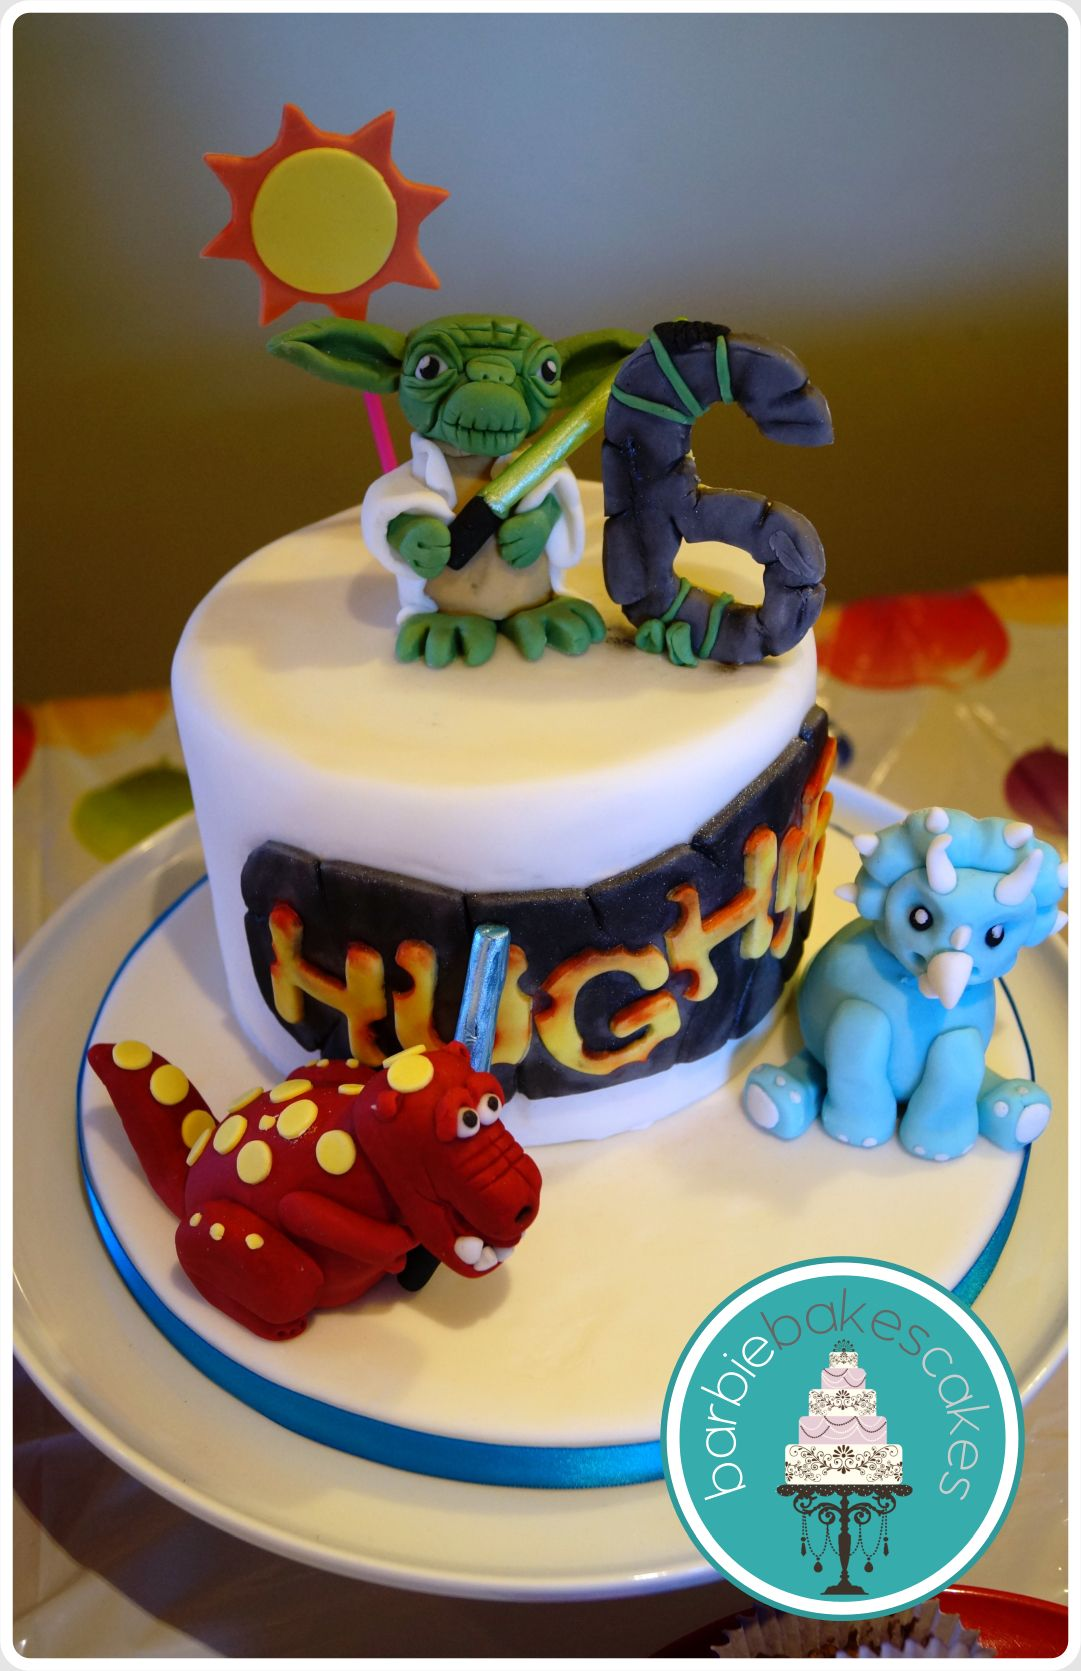 Star Wars V Dinosaurs Birthday Cake Barbie Bakes Cakes Web Www